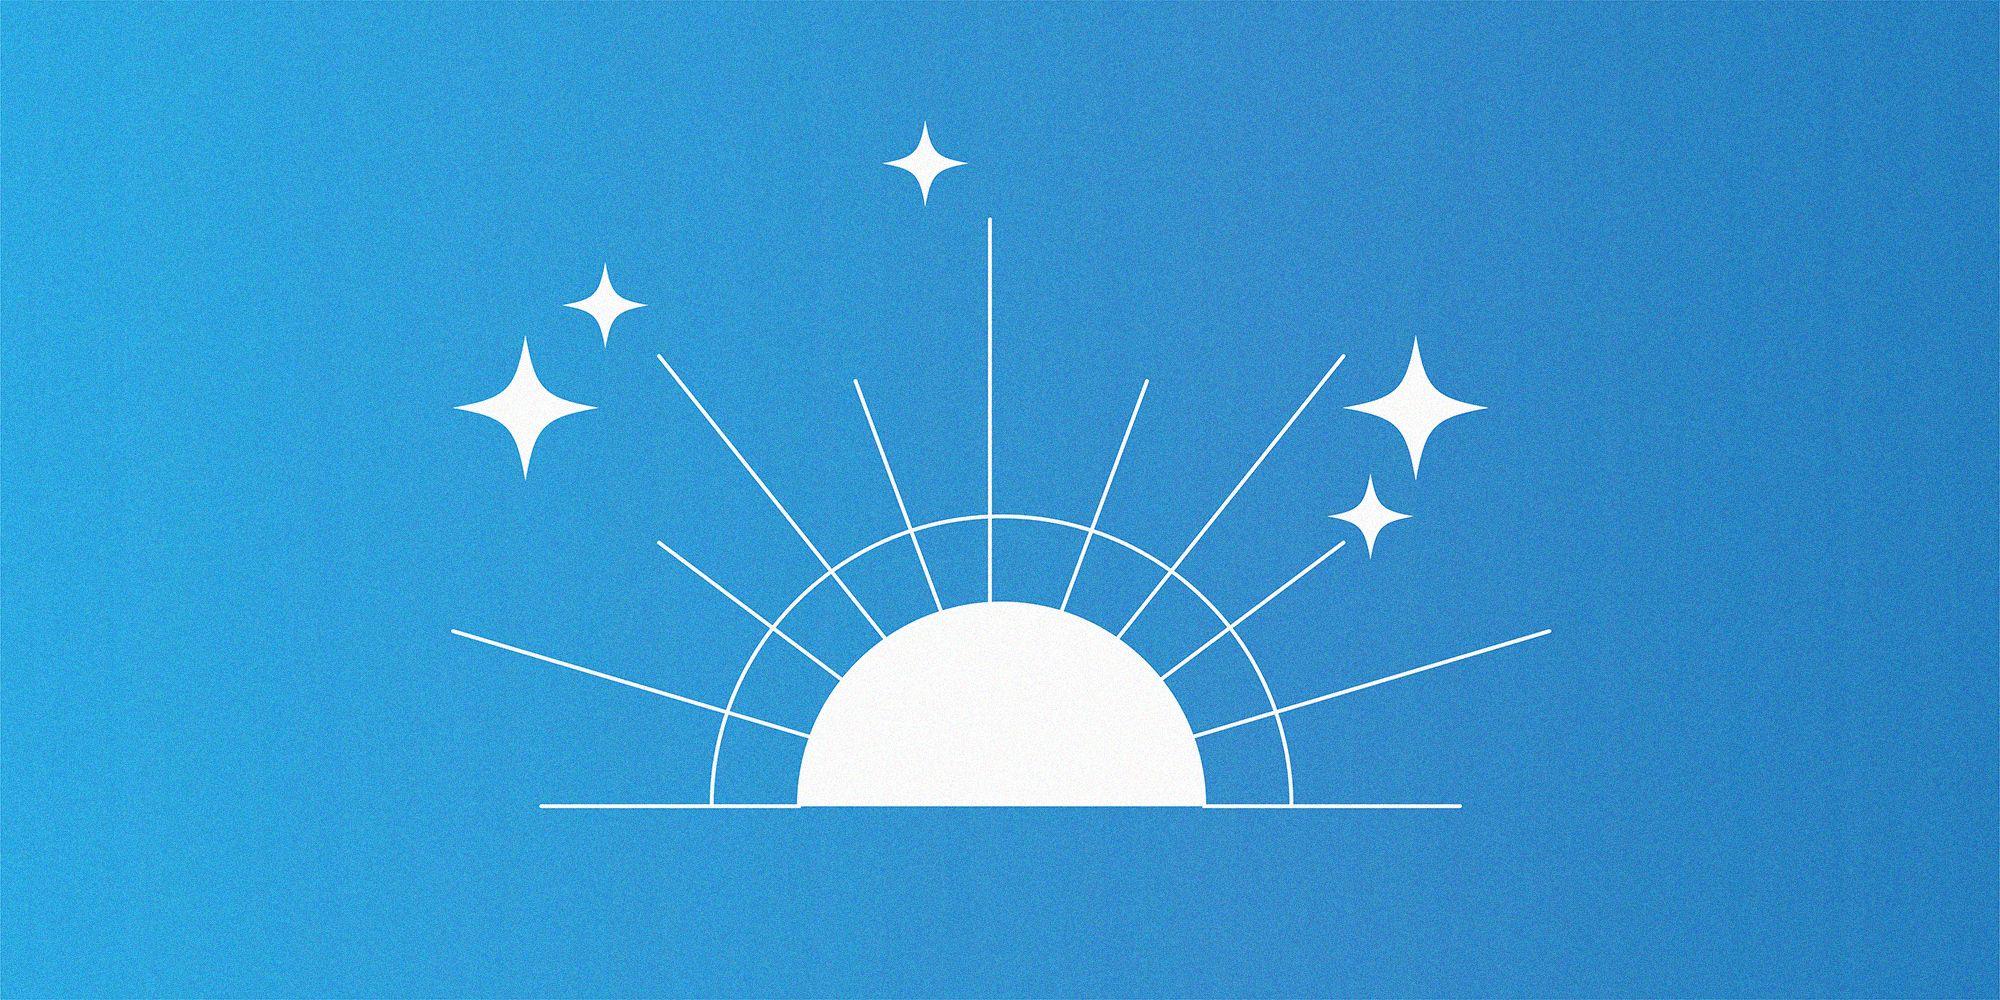 Tatler's Weekly Horoscope: Week of July 25-31